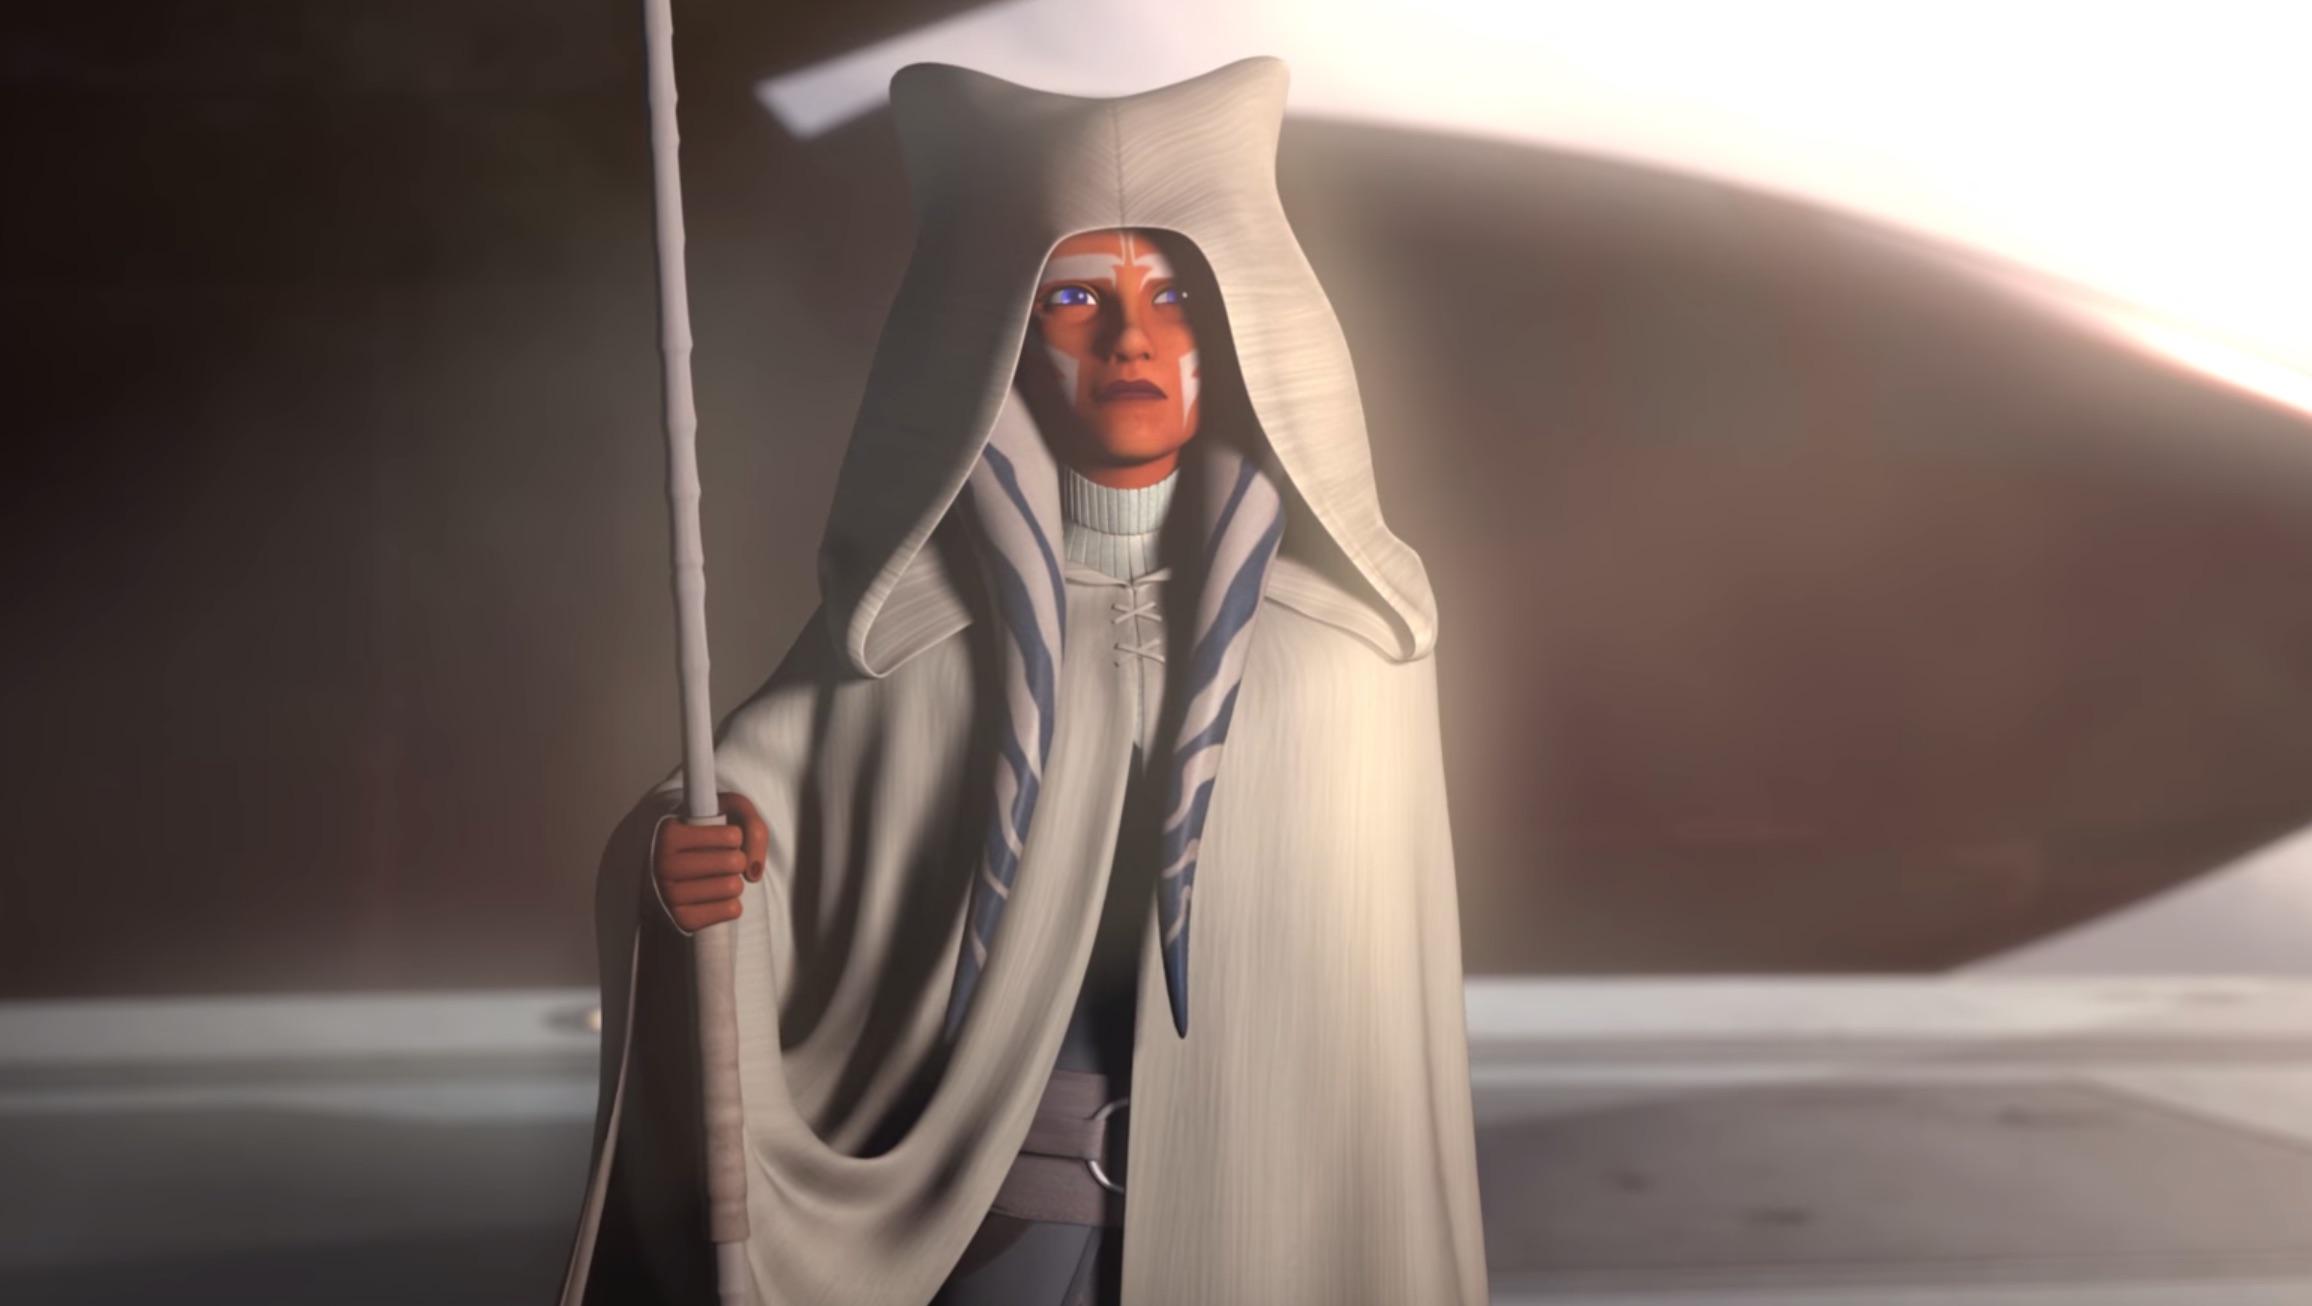 Ahsoka in her white garb in 'Star Wars Rebels' Epilogue